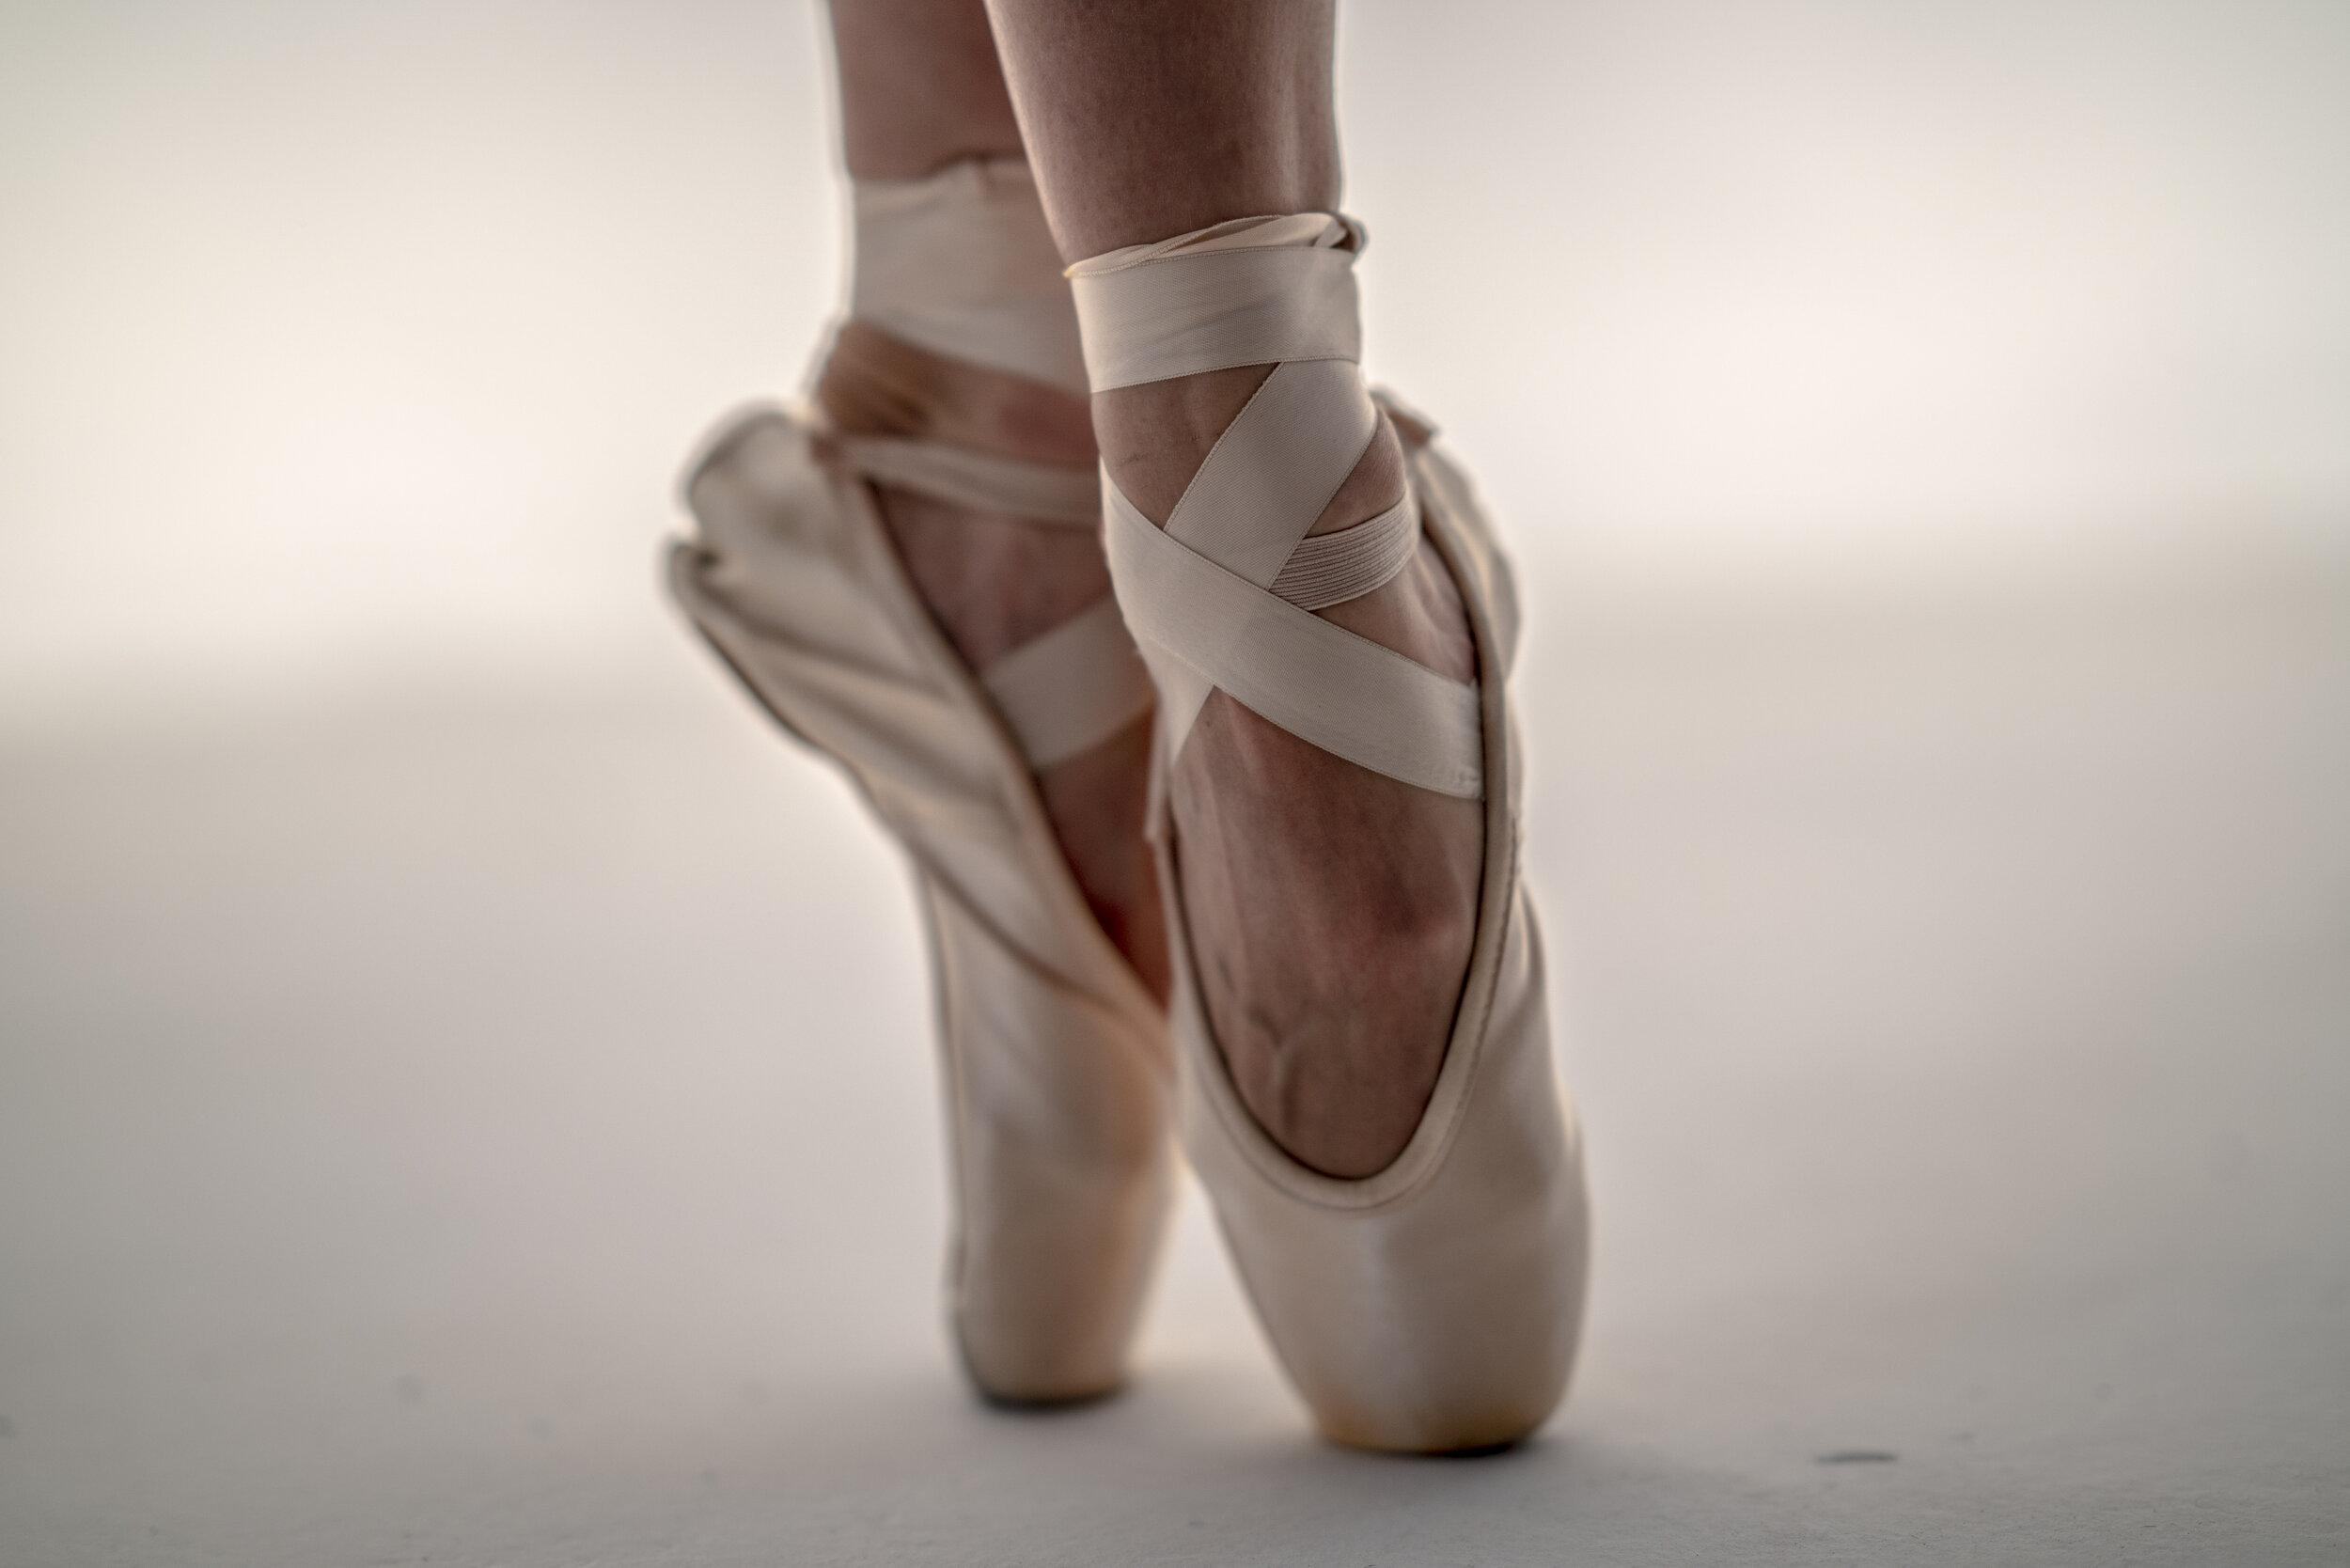 close-up of a ballet dancer's foot en pointe